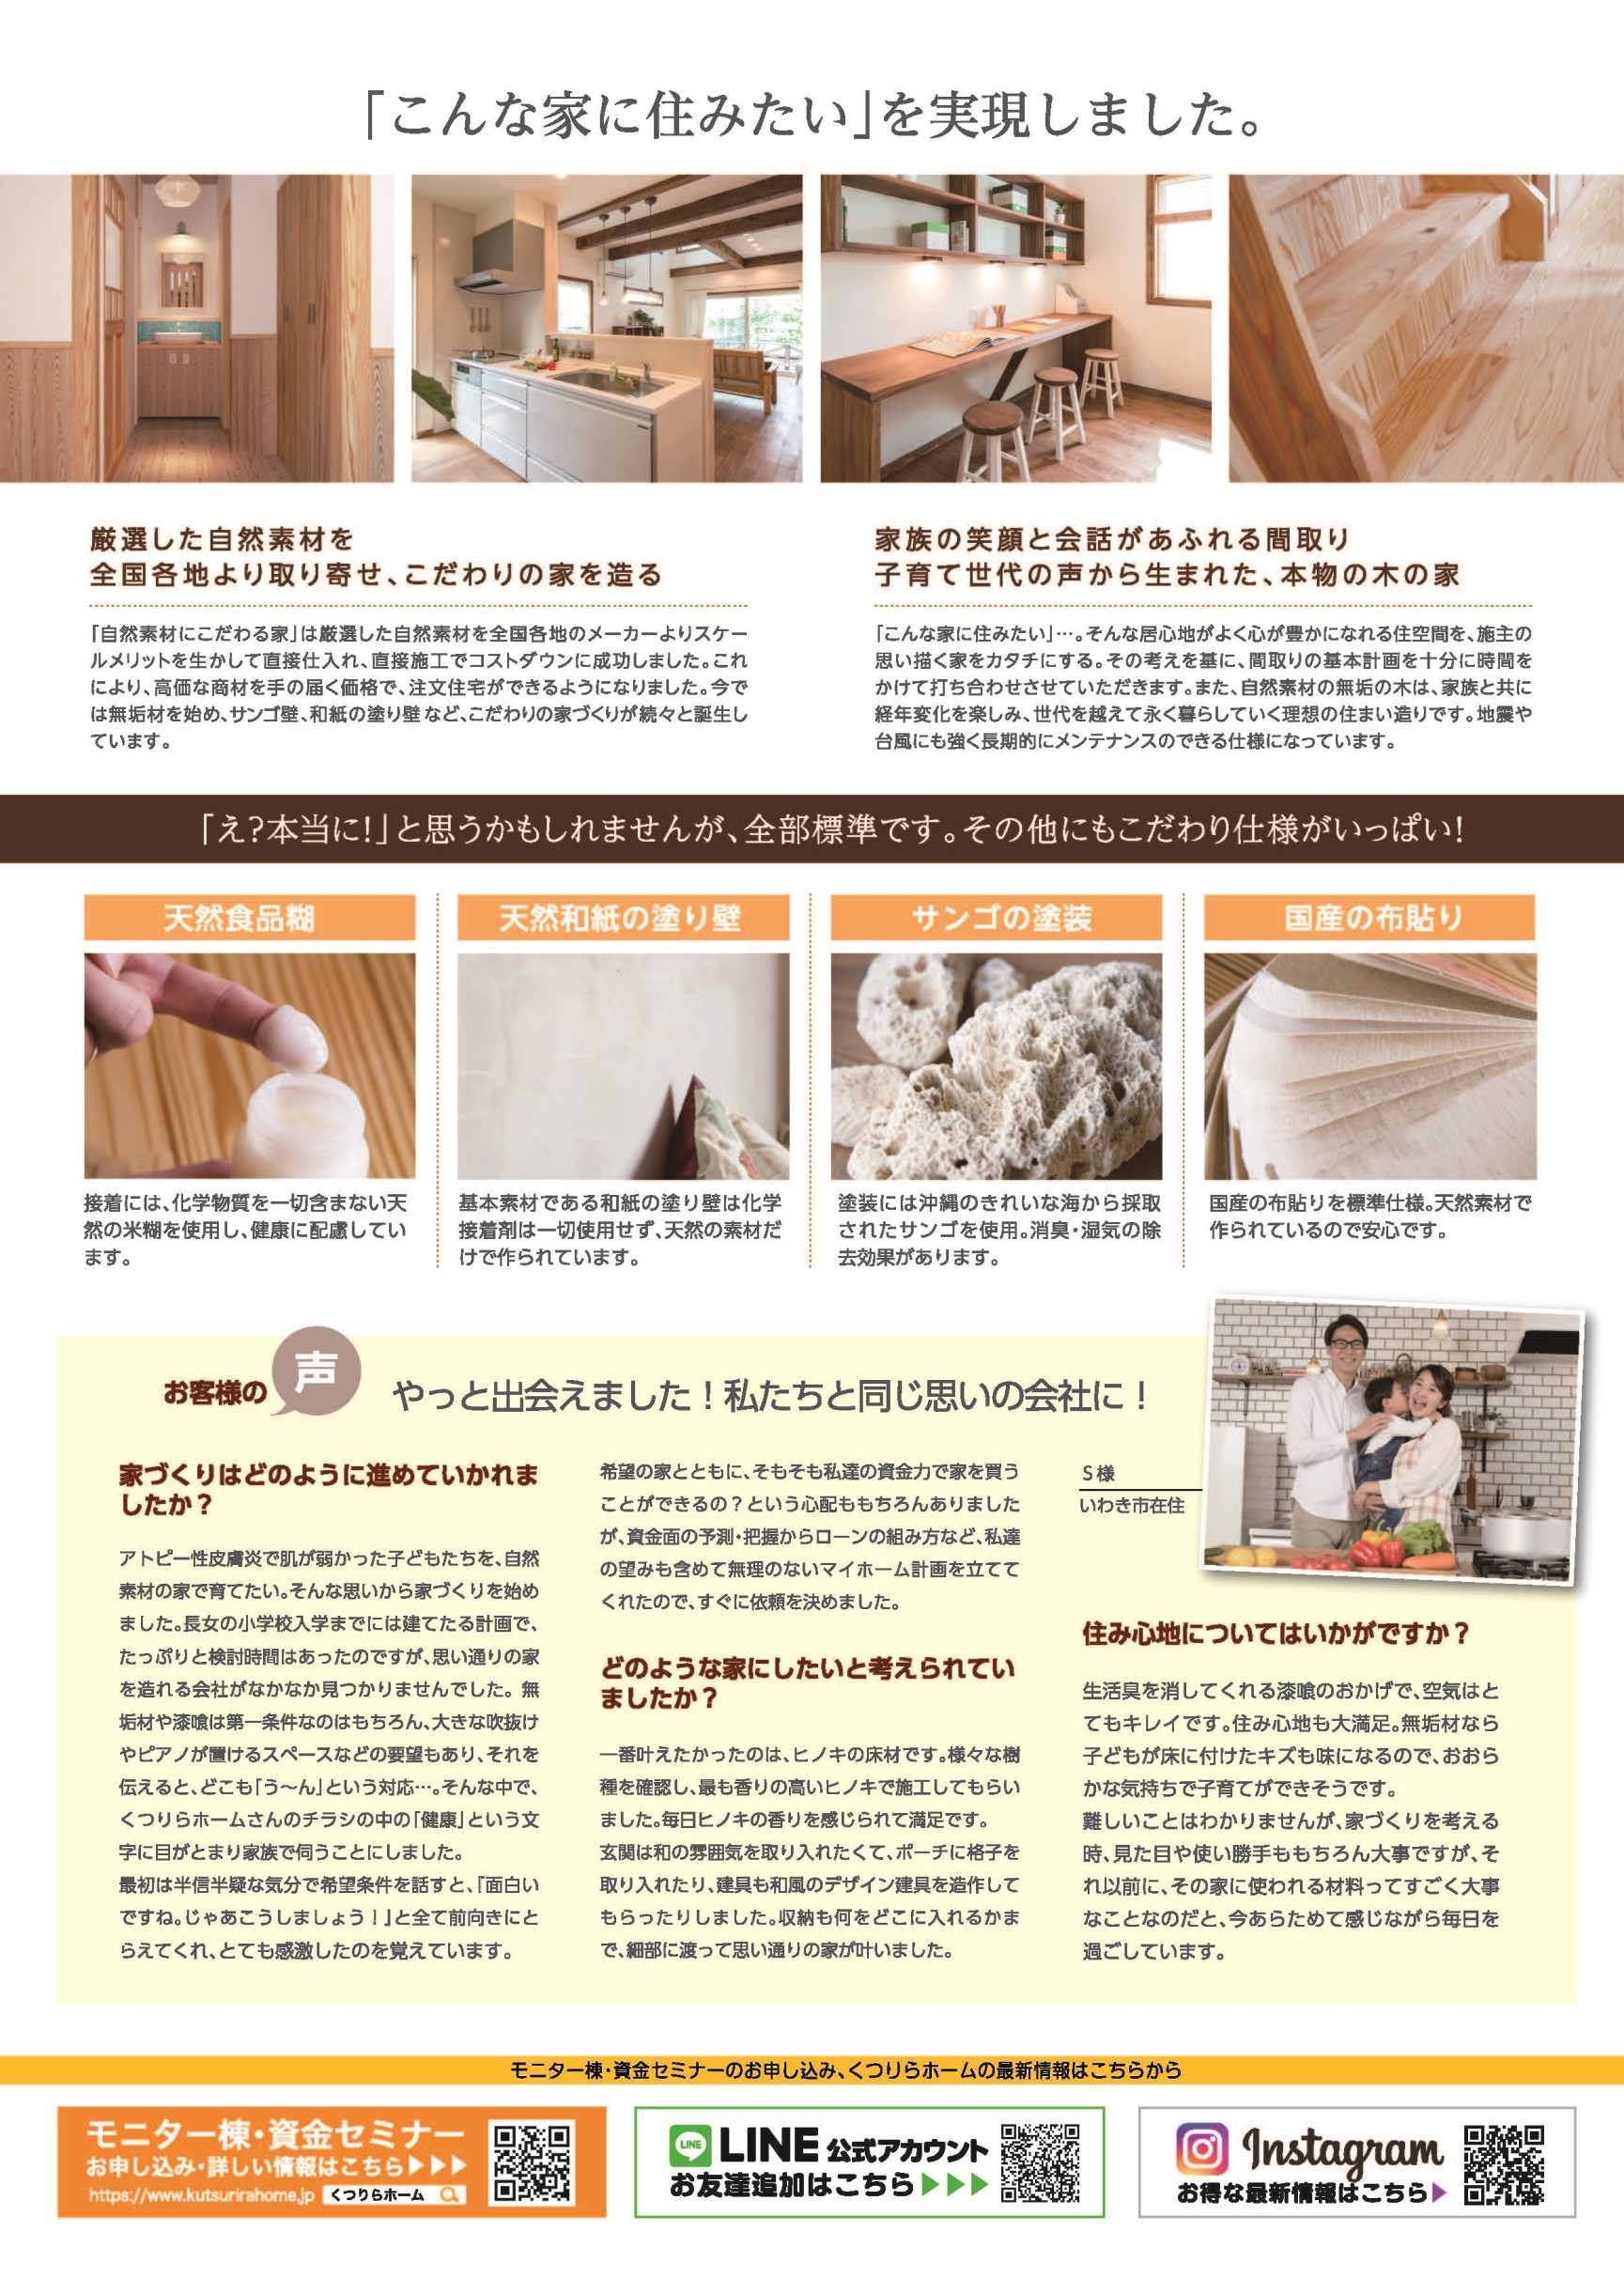 Kutsurira_chirashi2.jpeg